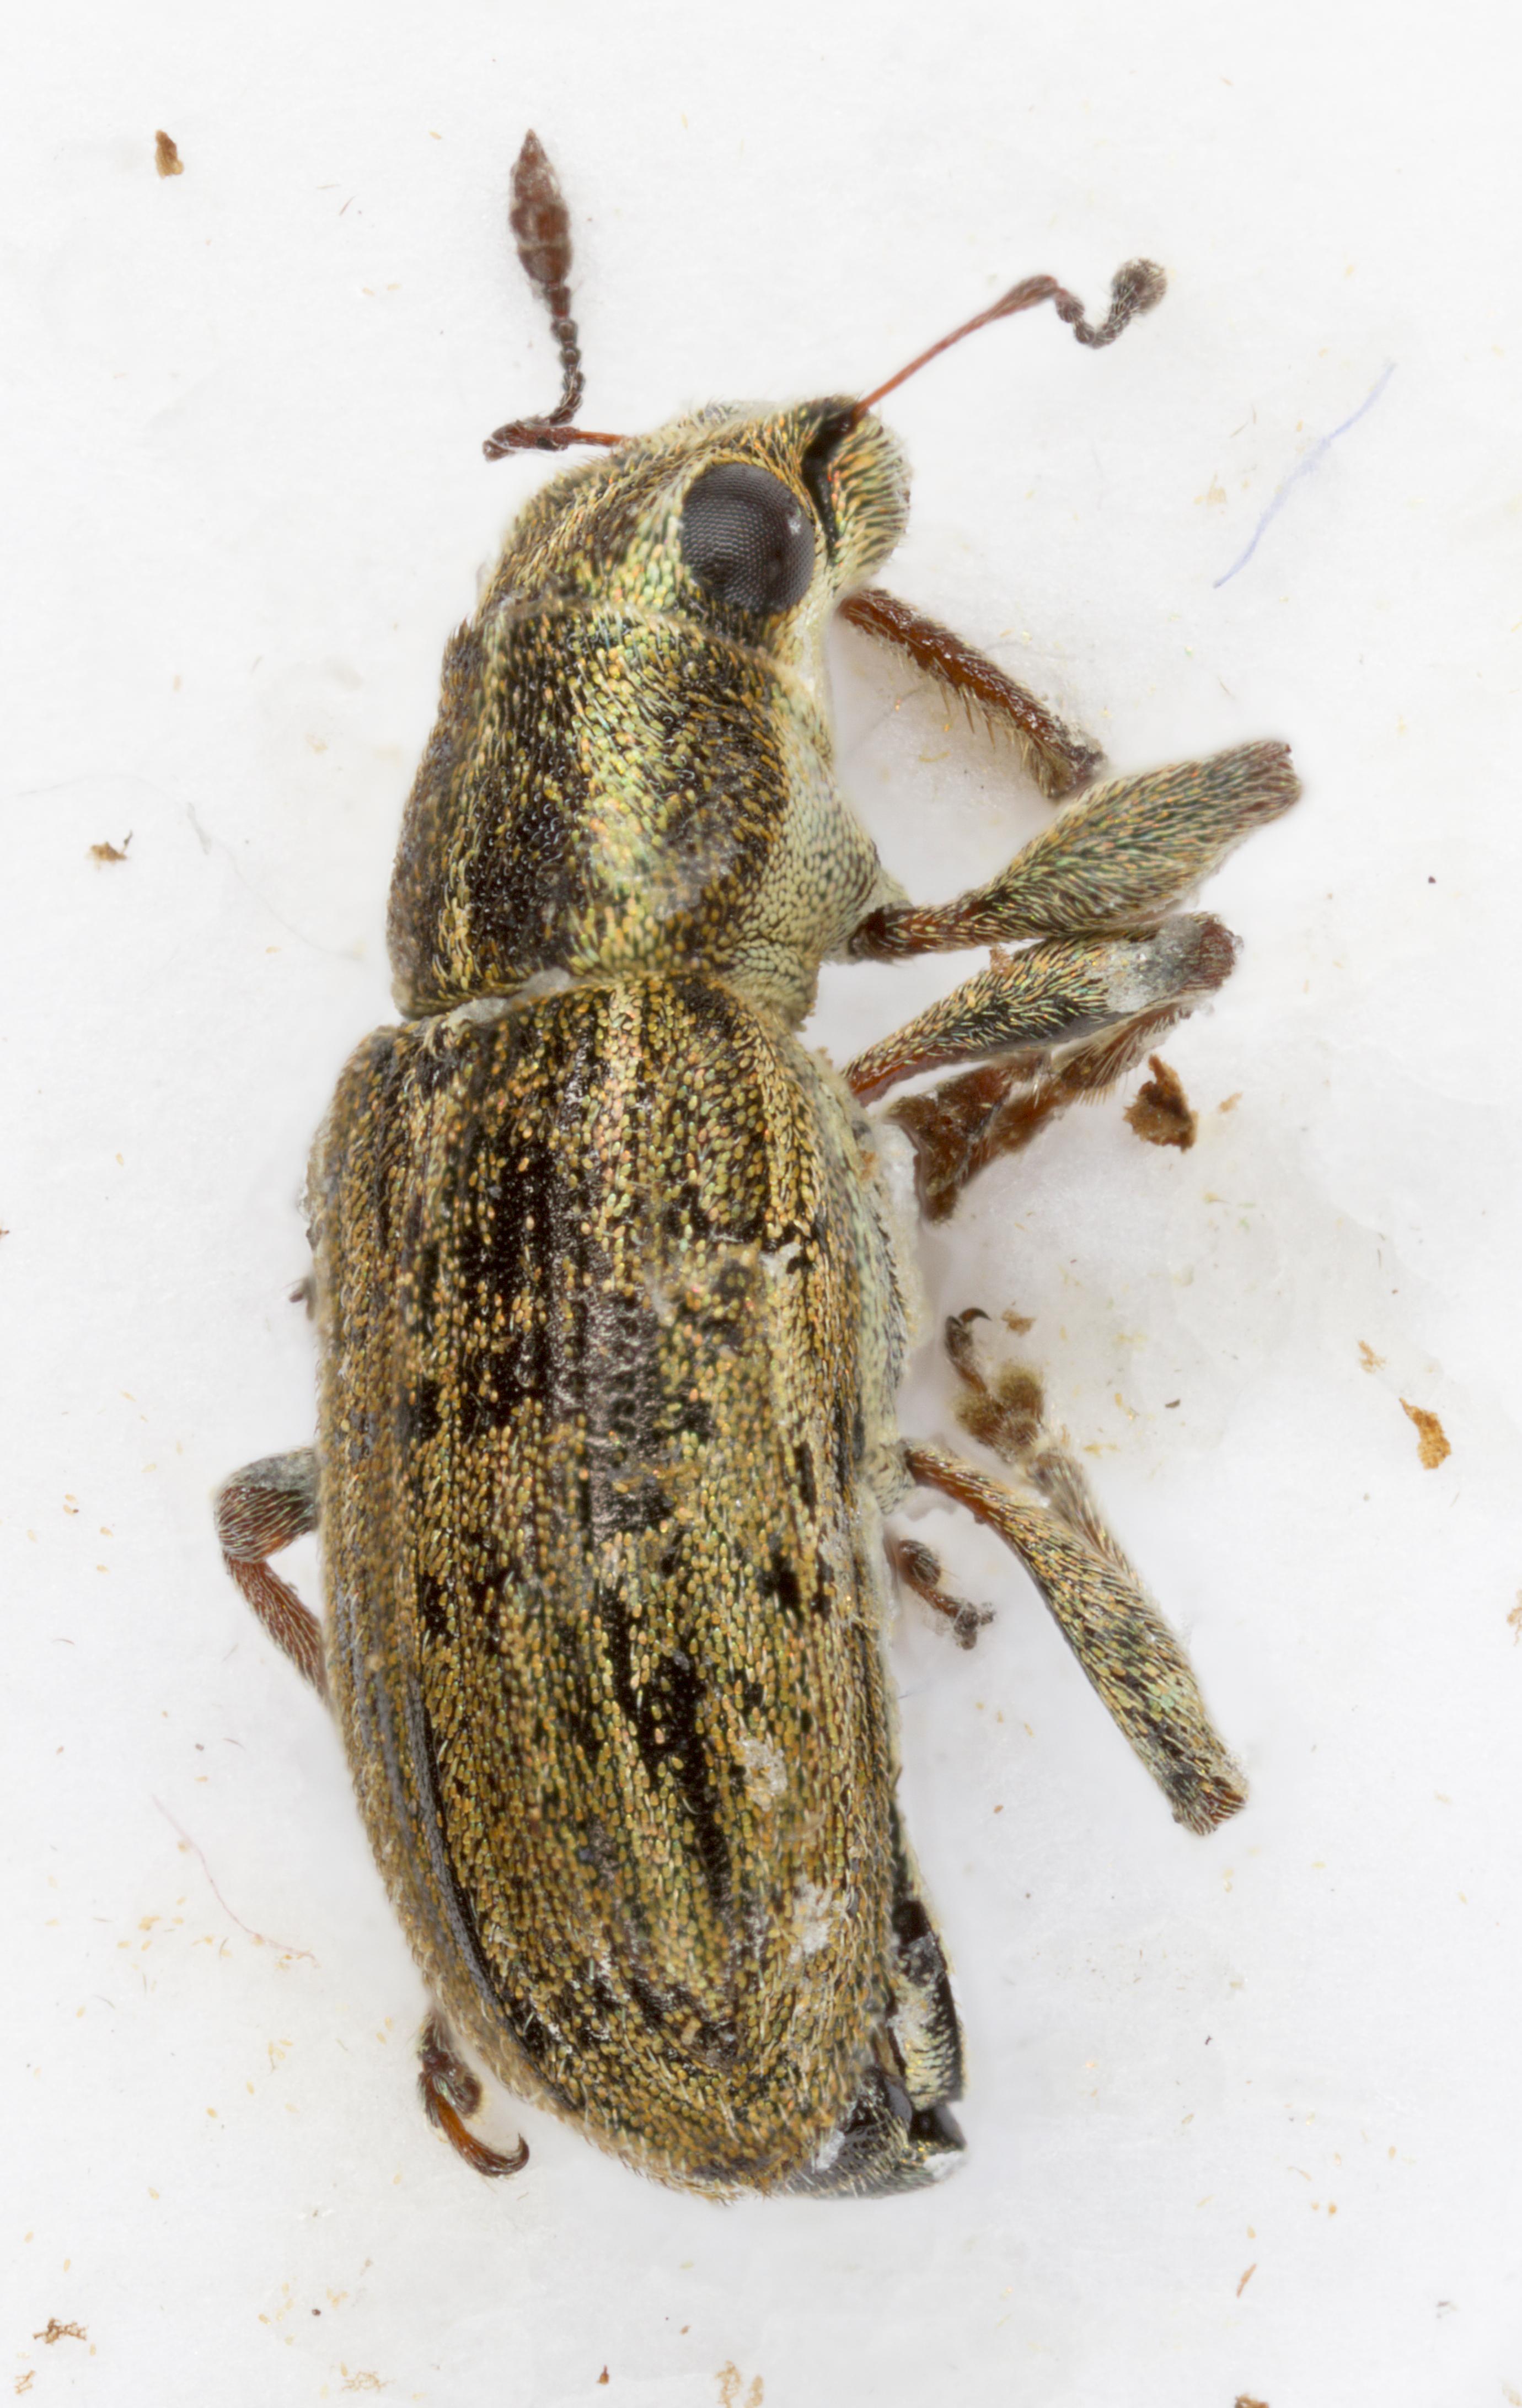 Image of Sweetclover Weevil